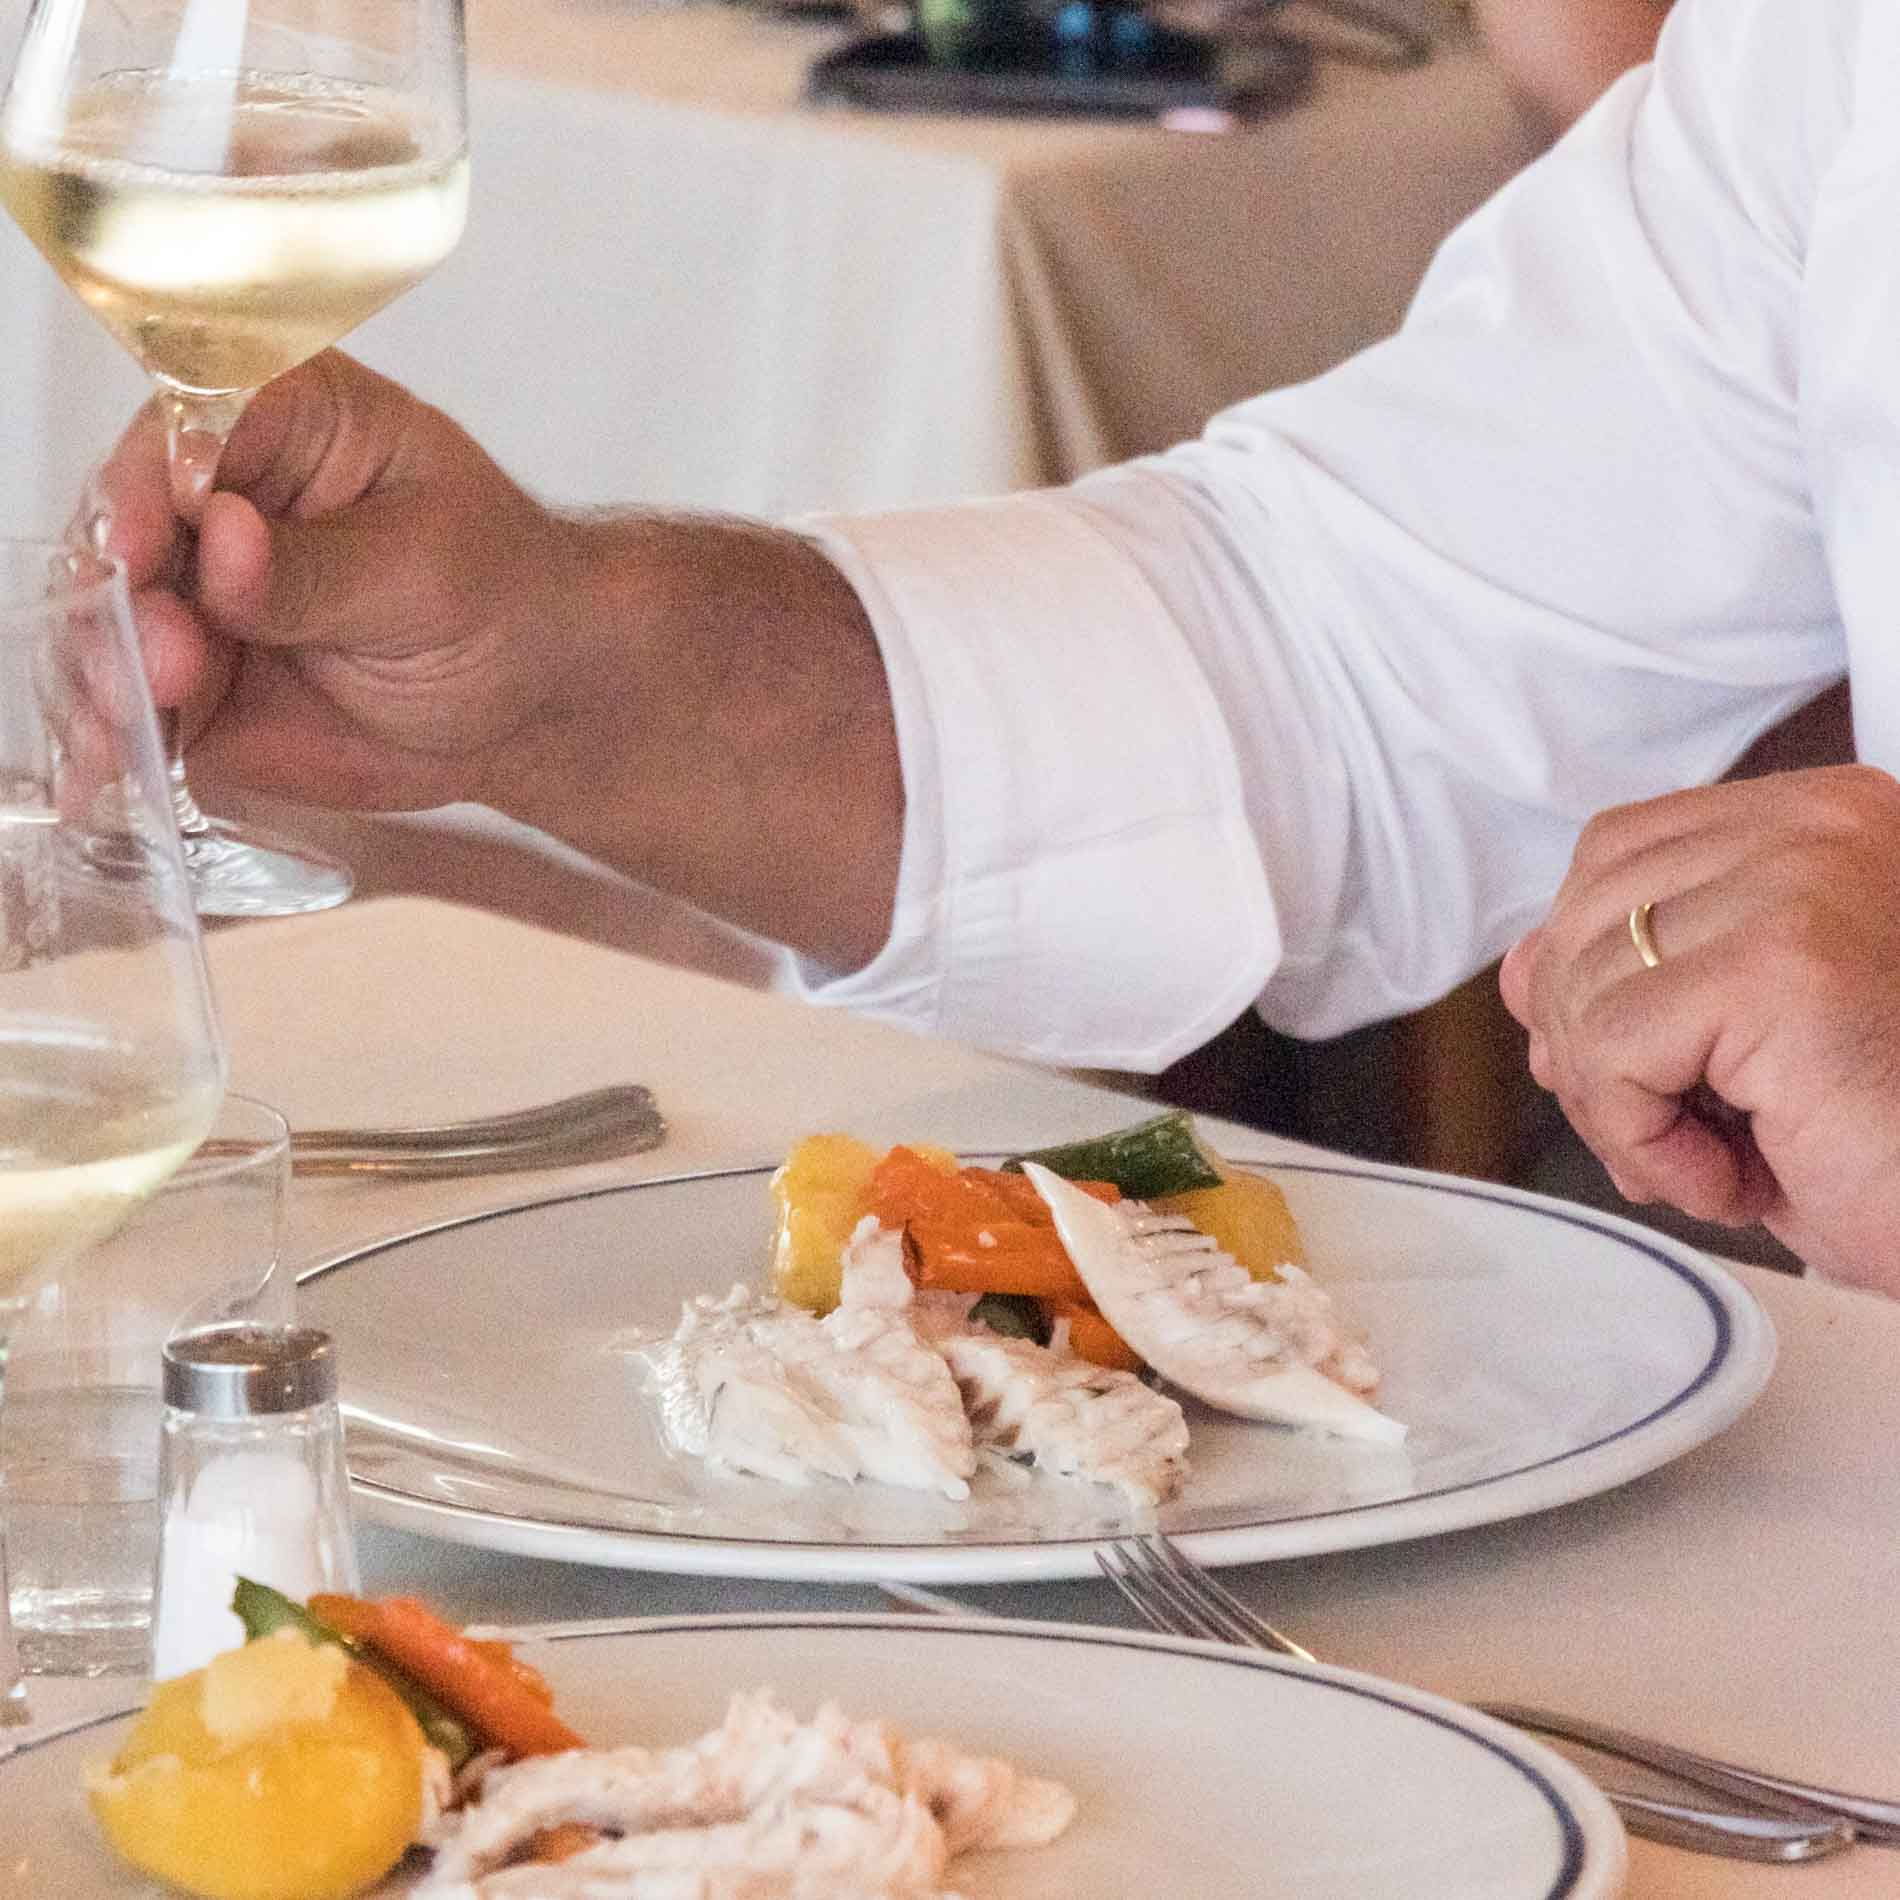 la-piedigrotta-ristorante-da-carmine-e-antonio-194